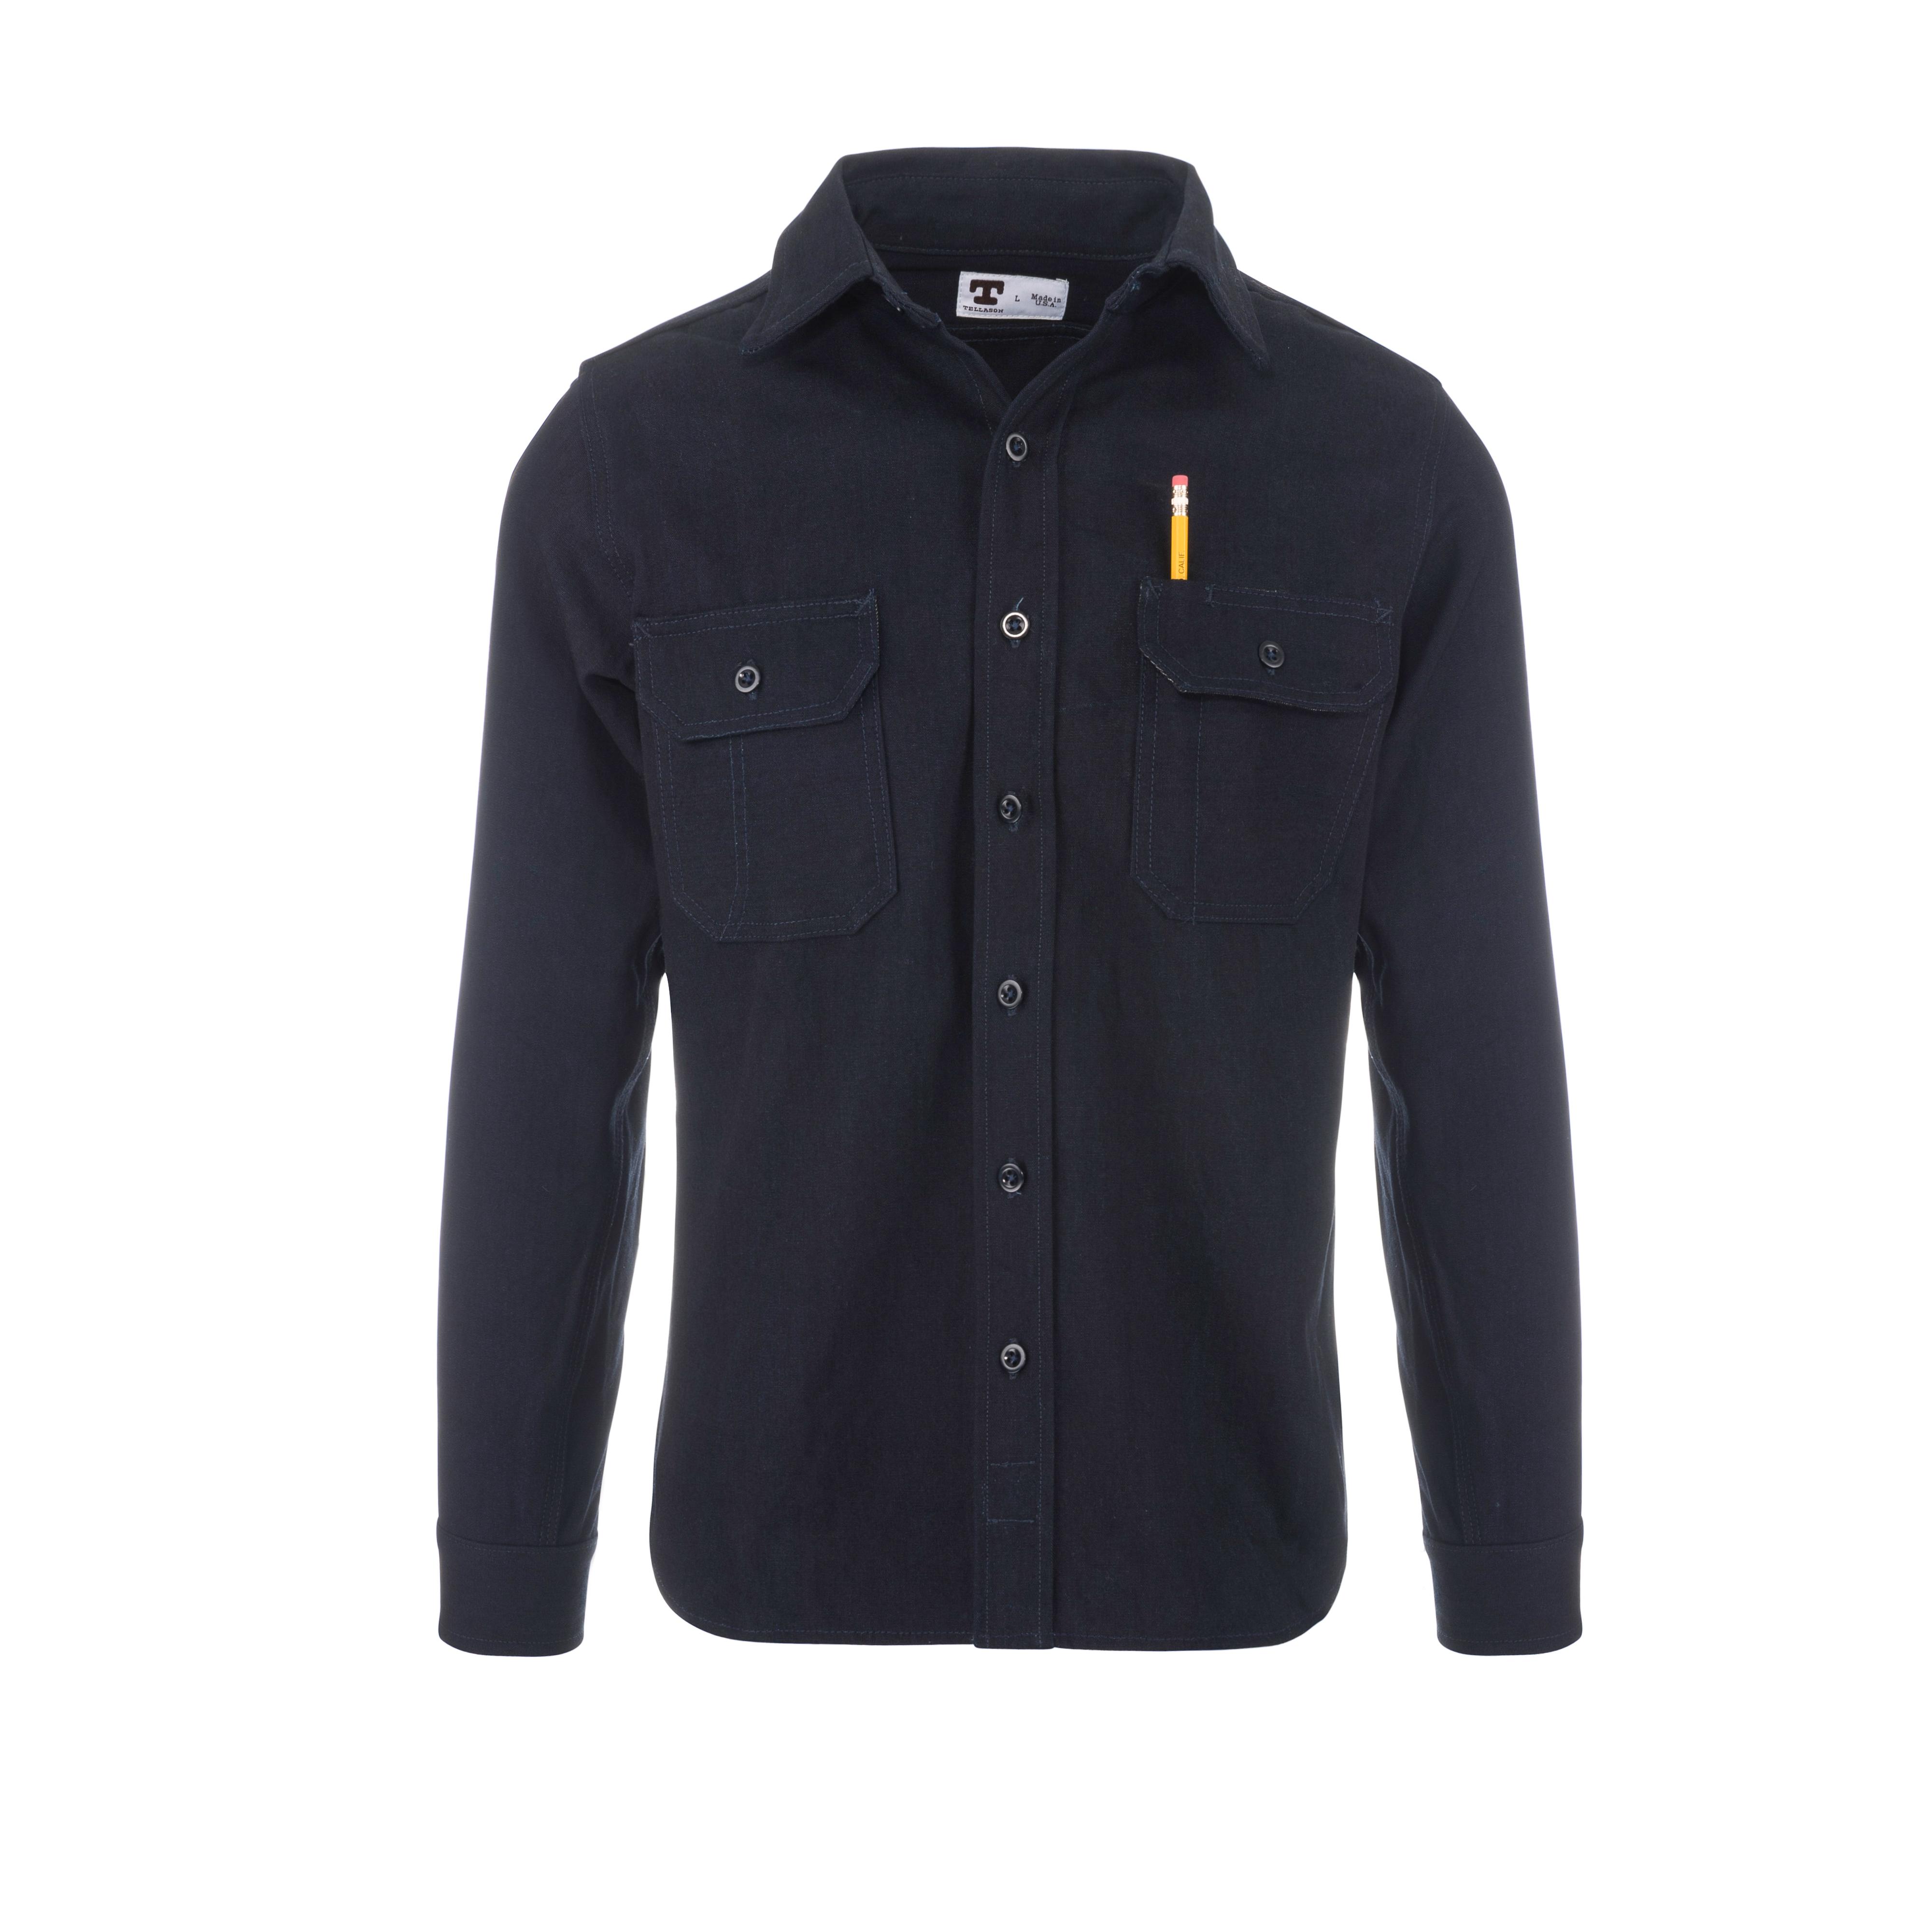 Clampdown Shirt 12.8oz Rinsed Indigo